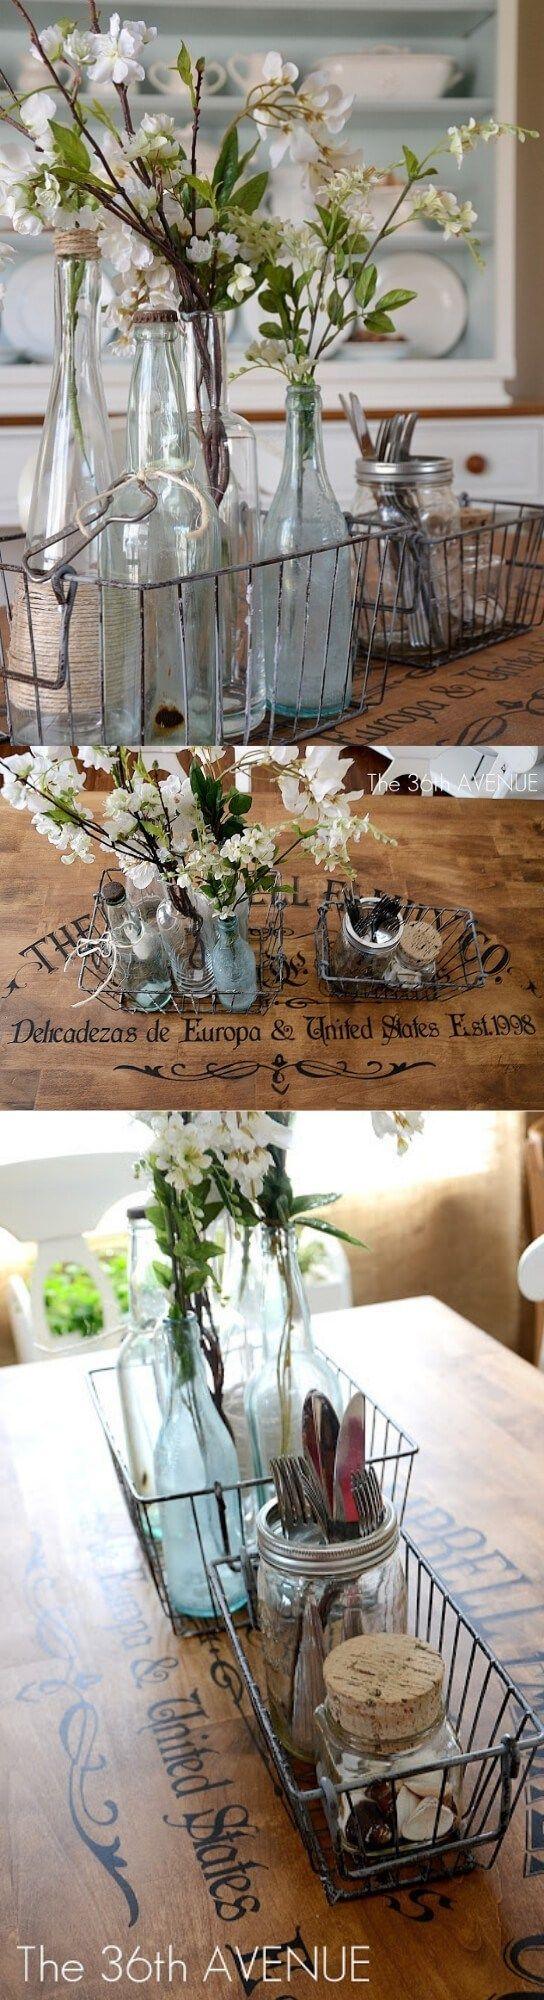 28 Simple Dining Room Ideas For A Stunning Inspiration: 28+ Stunning Farmhouse Dining Room Decor & Design Ideas